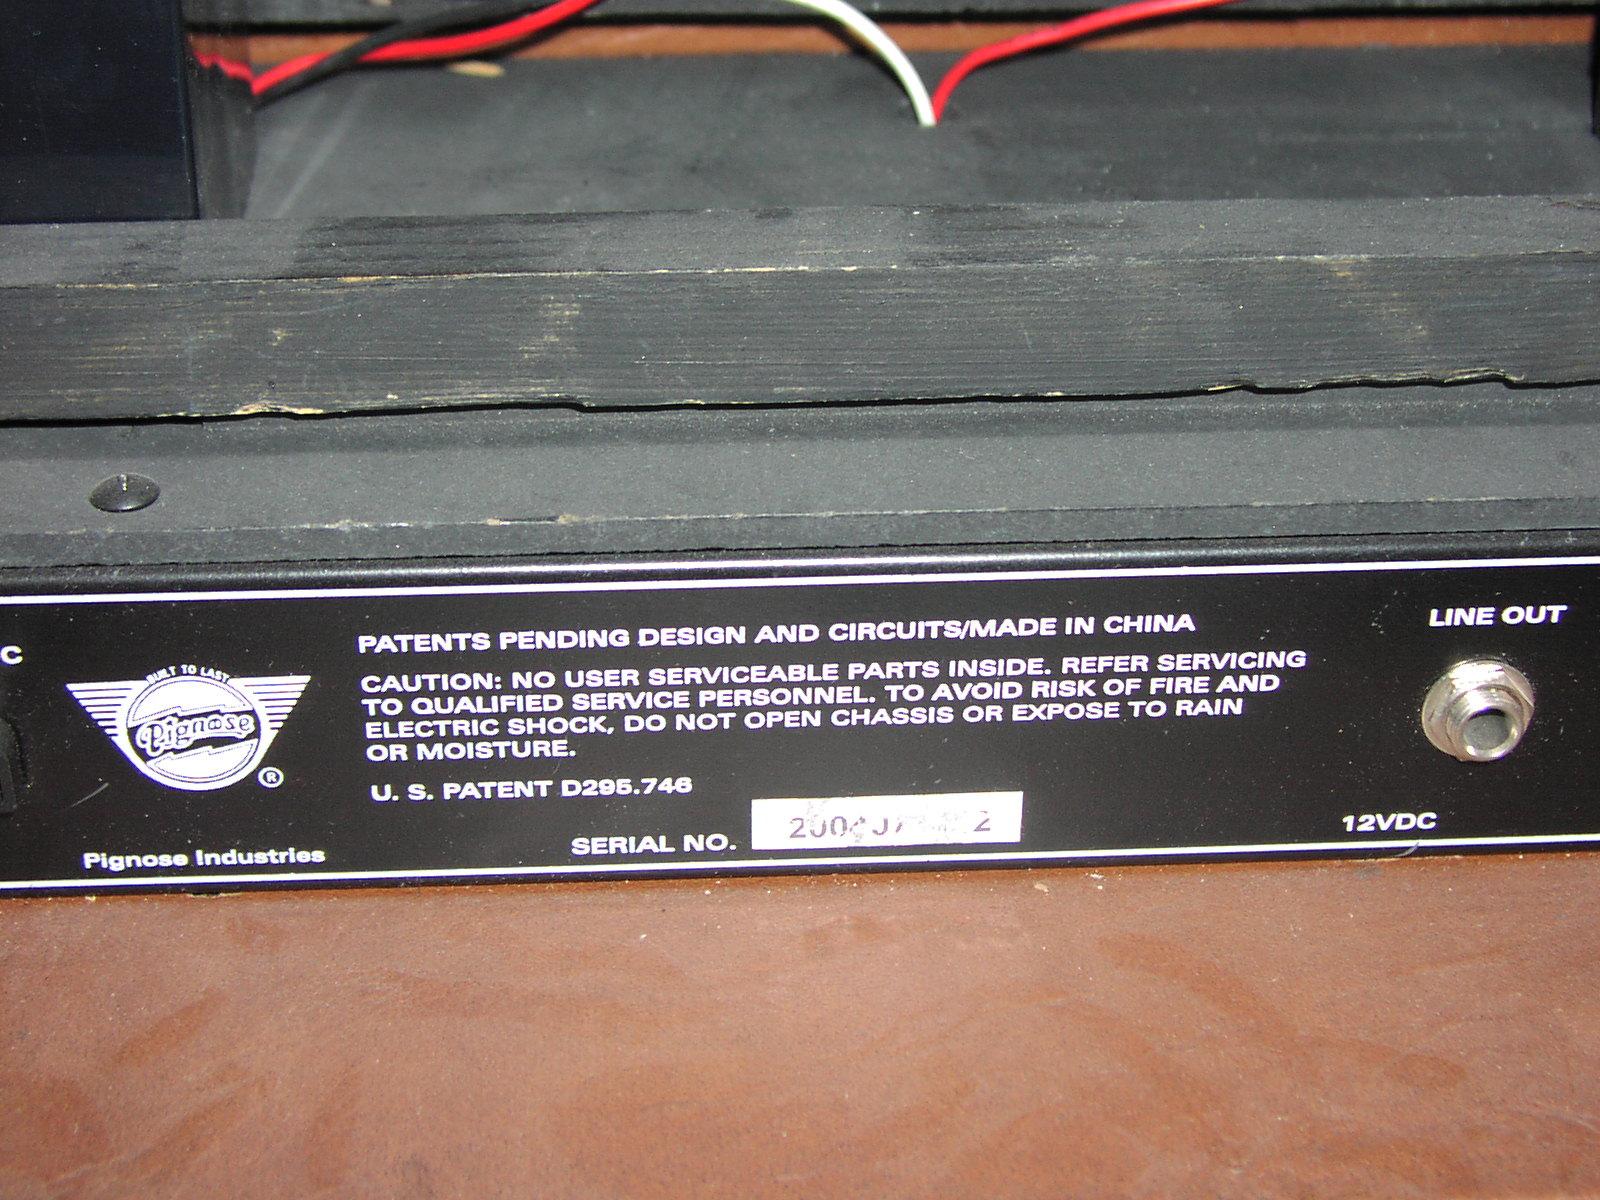 pignose amp 30 circuit library of wiring diagram u2022 rh jessascott co Jazz Bass Wiring Diagram Hot Rod Wiring Diagram